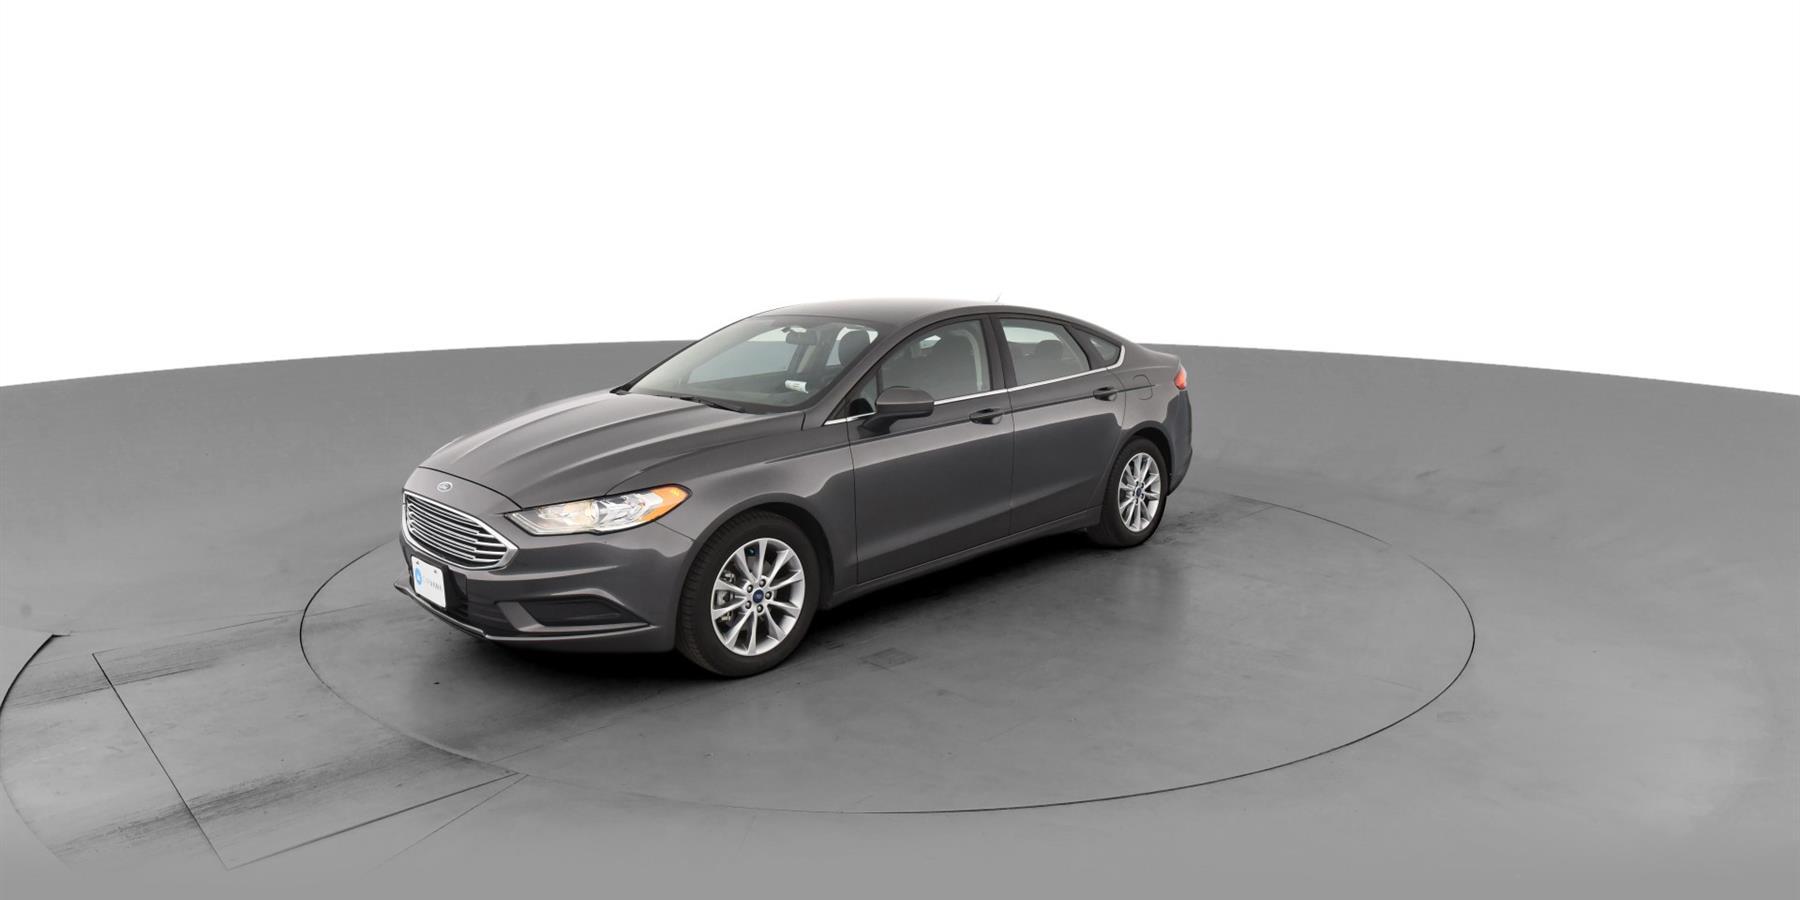 2017 Ford Fusion SE Sedan 4D for Sale   Carvana®